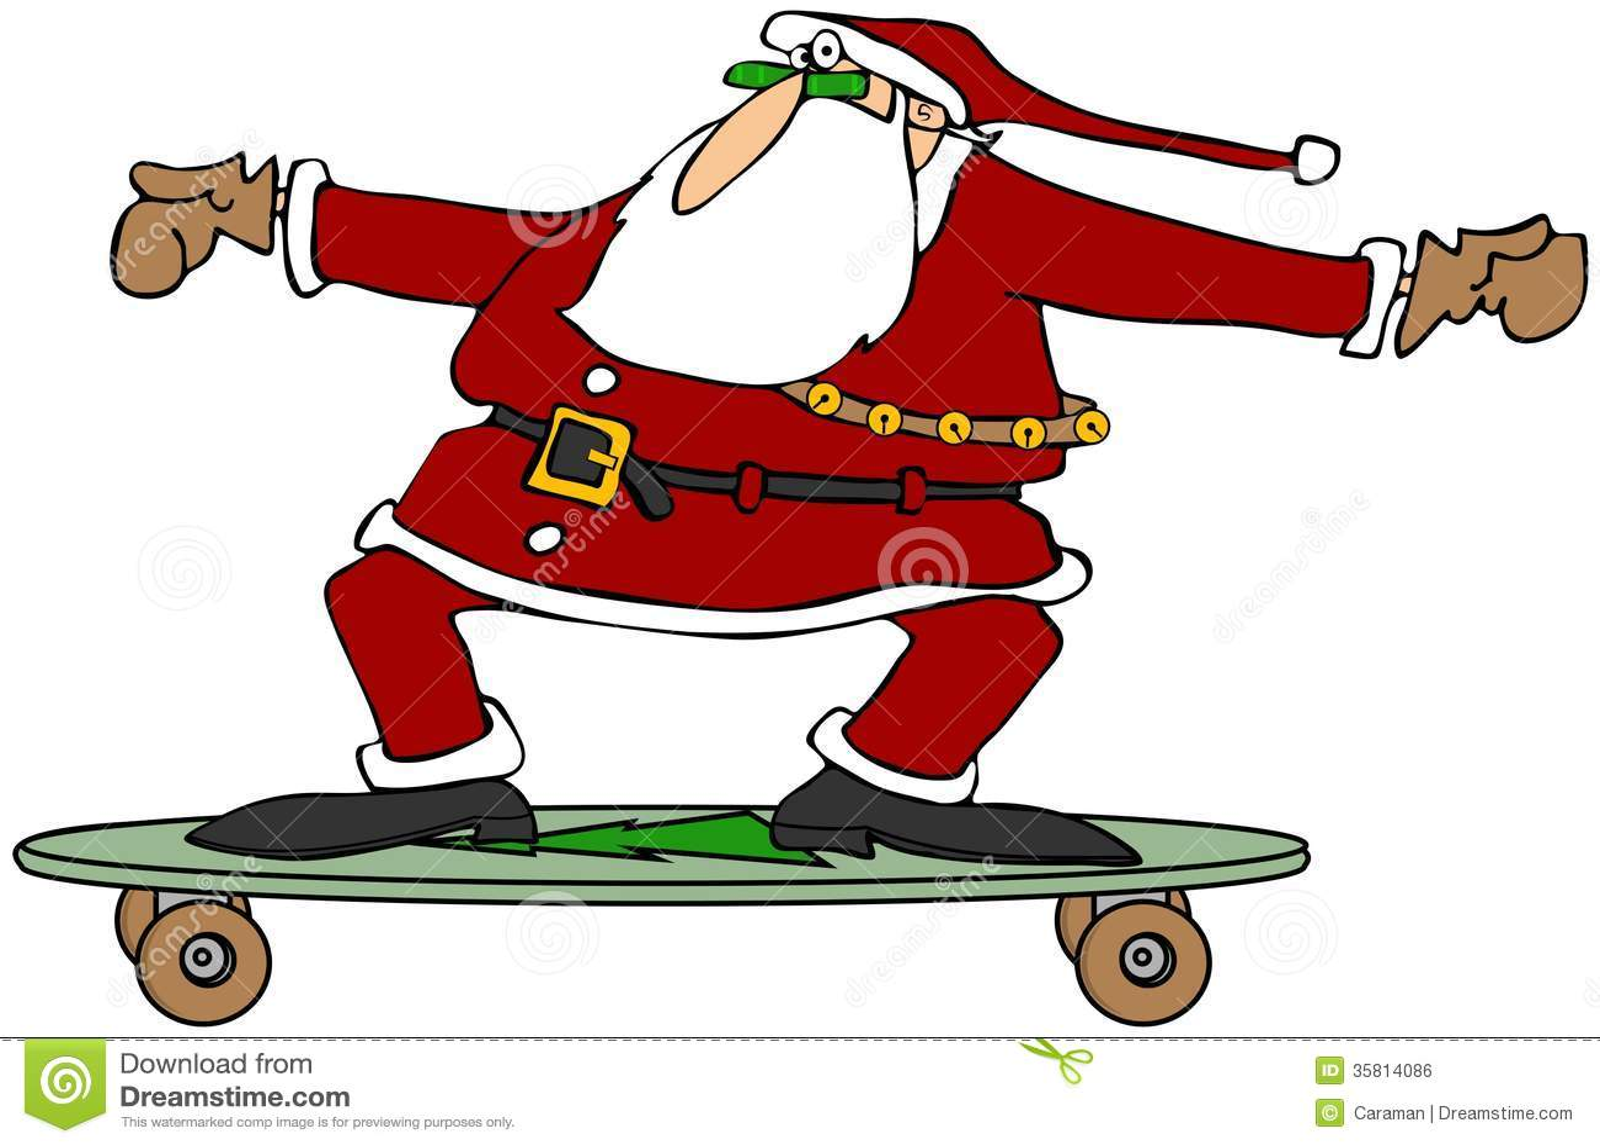 Santa On A Skateboard Stock Illustration Image Of Play Click Santa Claus Skateboard